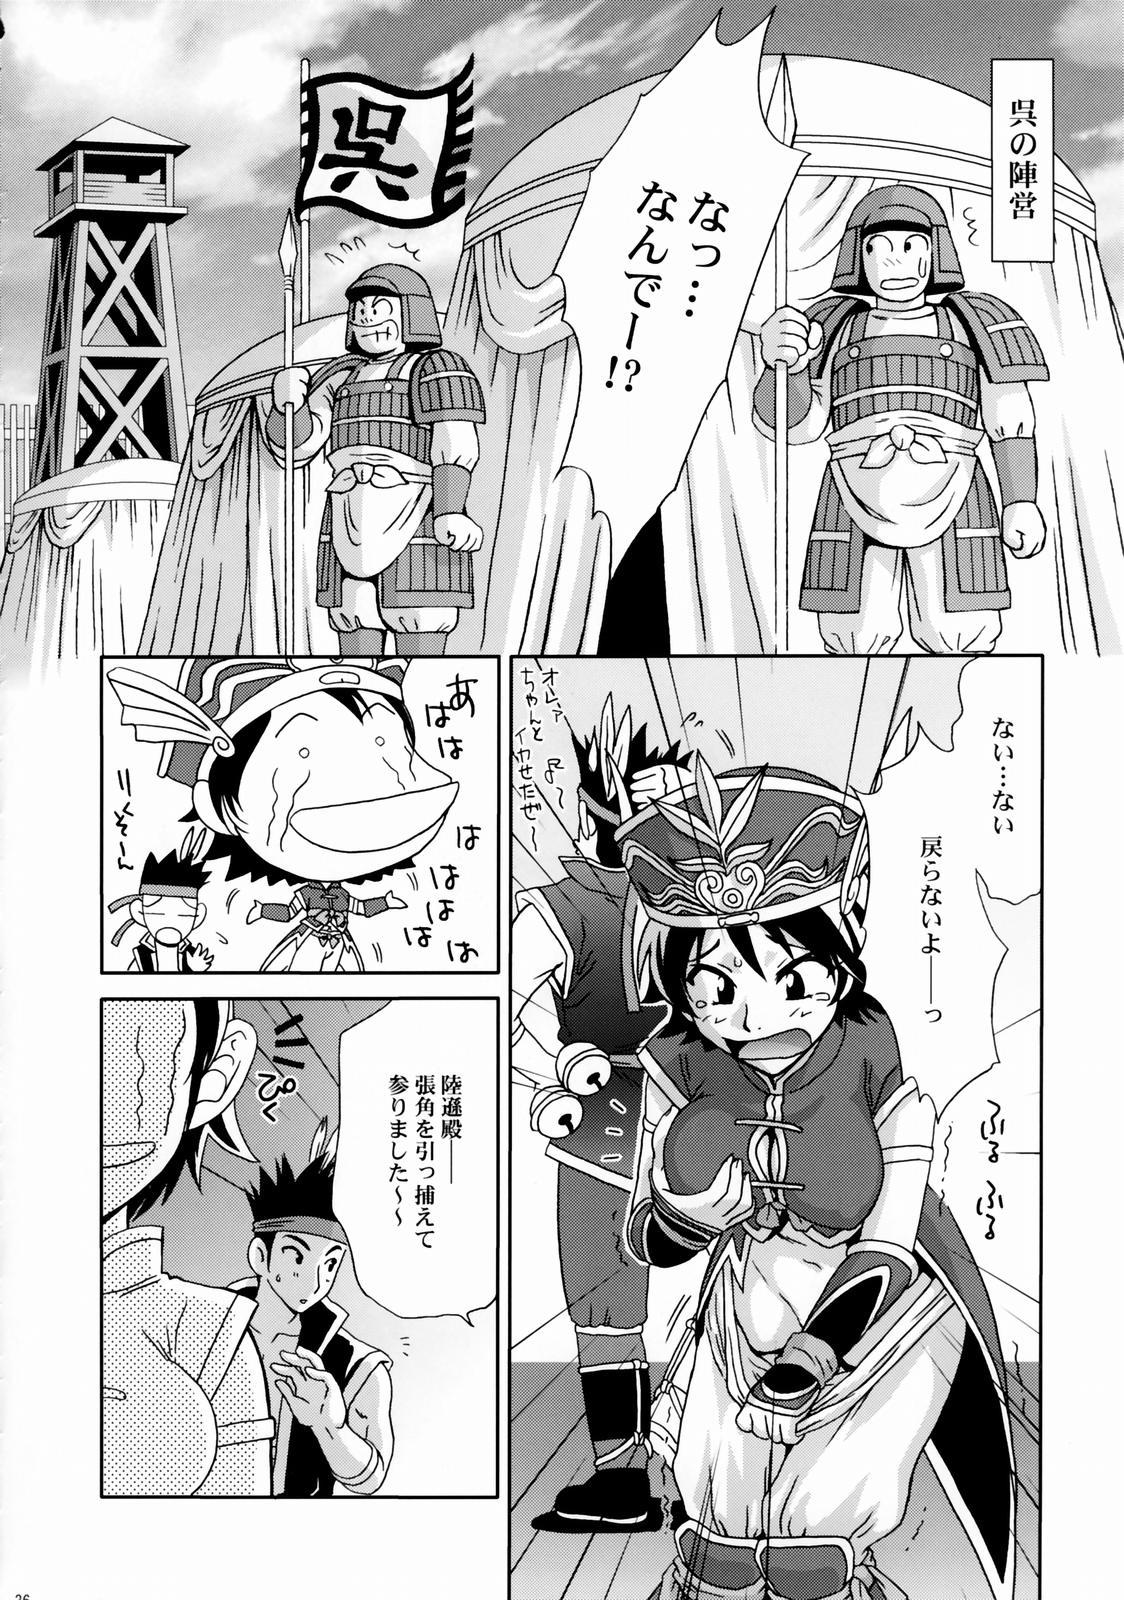 In Sangoku Musou Rikuson Gaiden 34